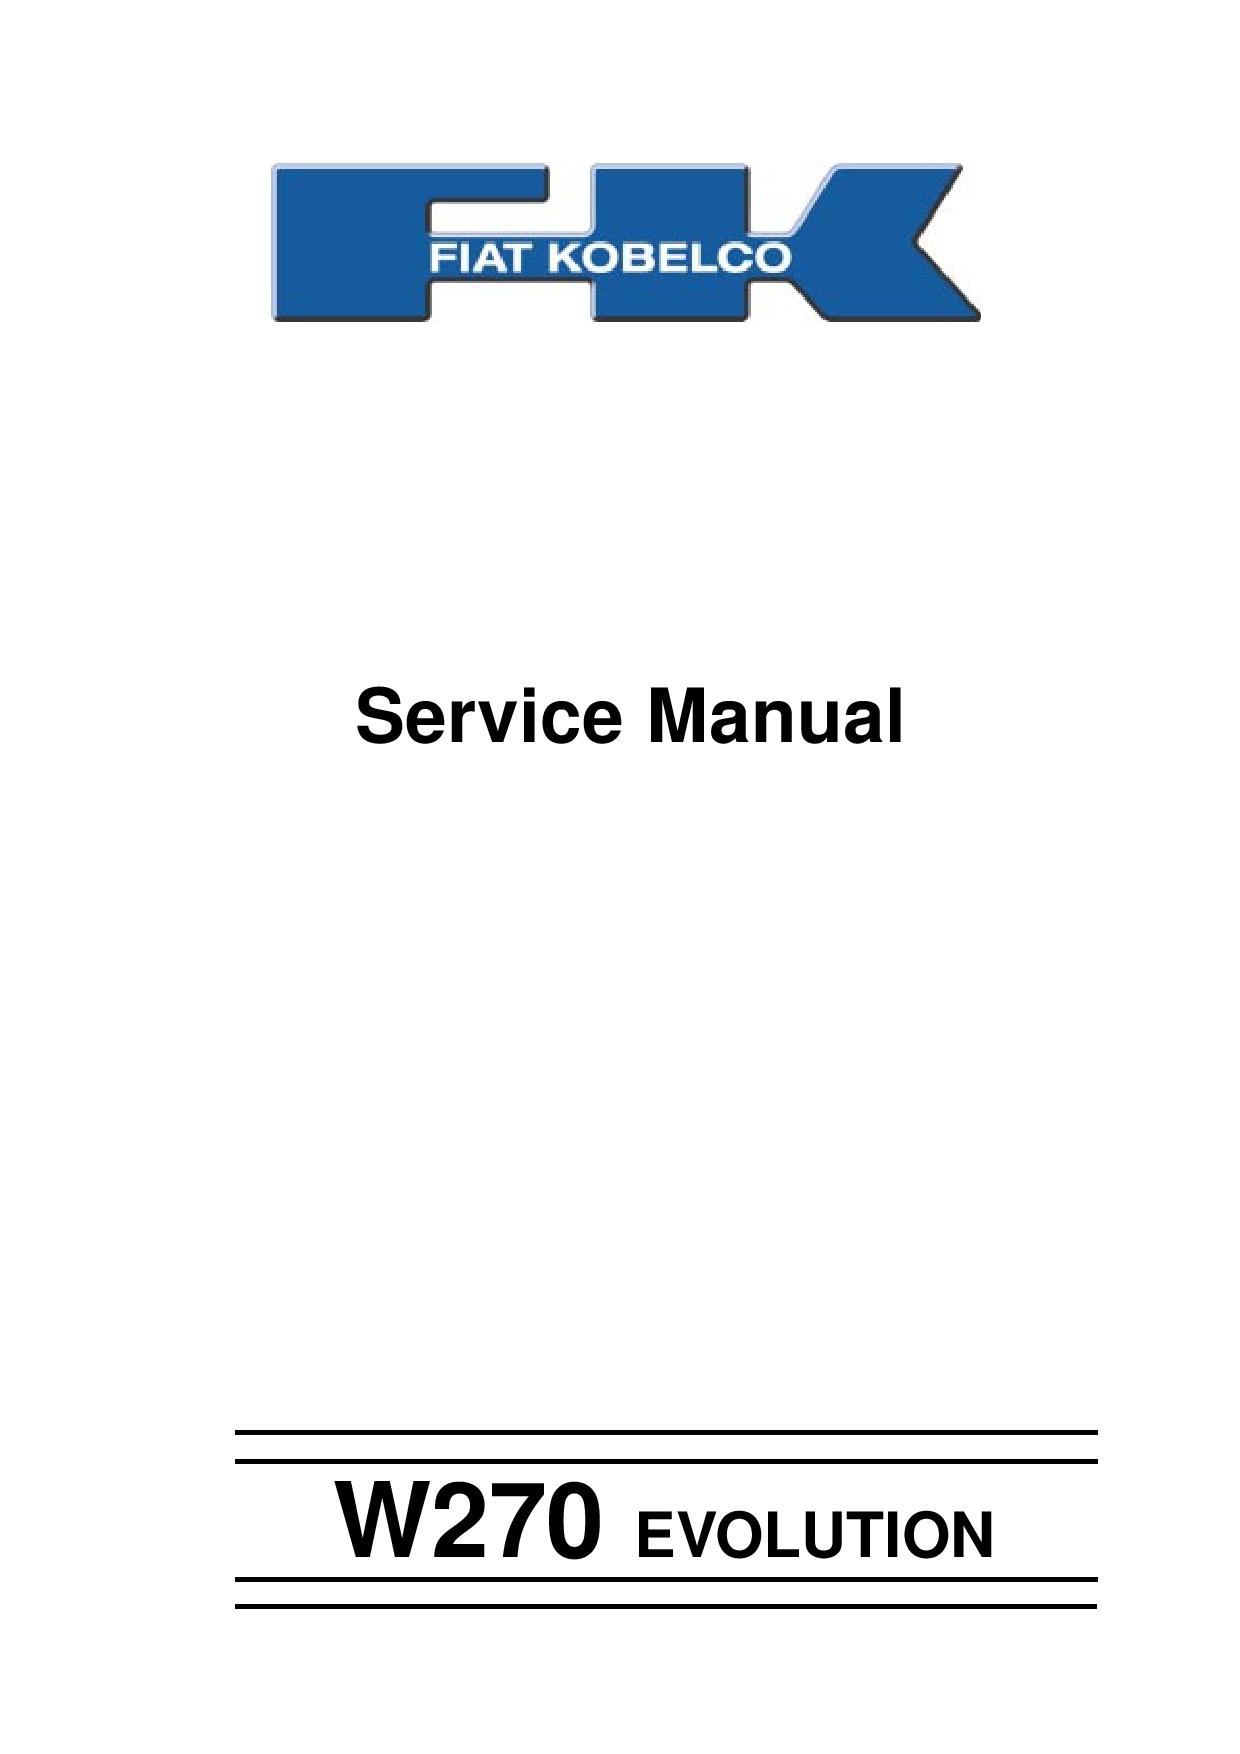 Fiat Kobelco W270 EVOLUTION WHEEL LOADER Service Manual